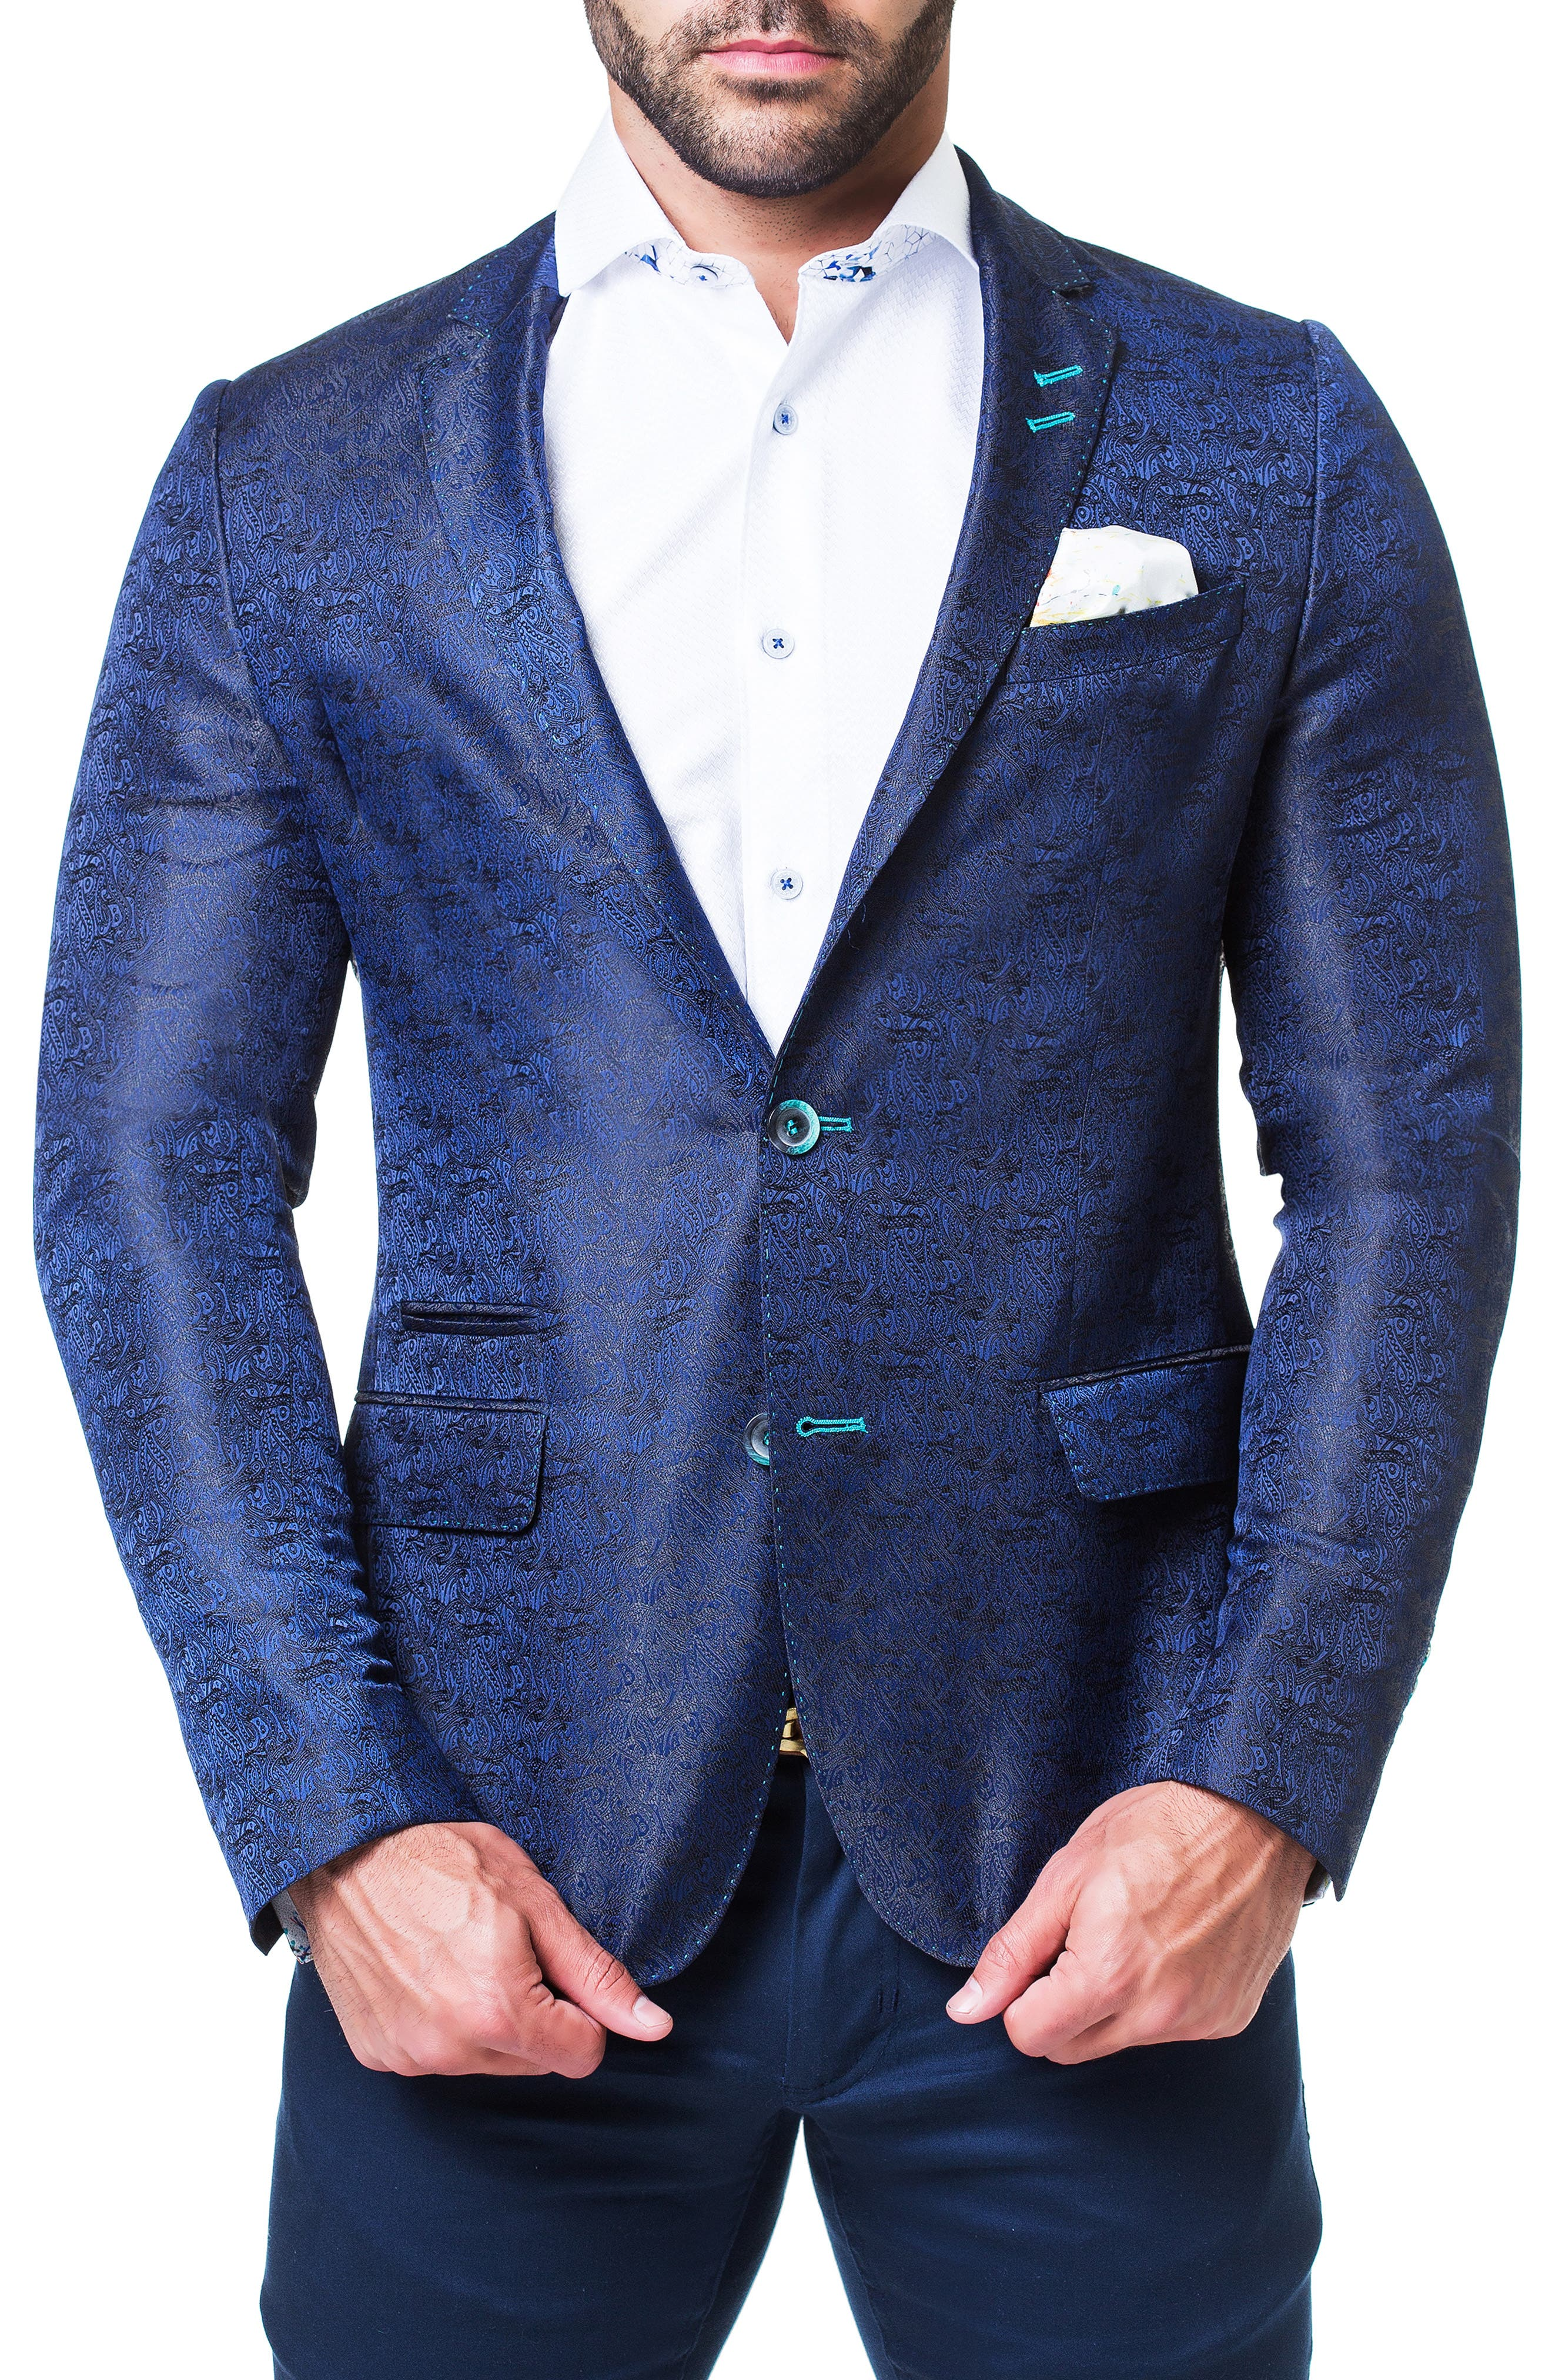 MACEOO Socrate Snake Jacquard Sport Coat in Blue